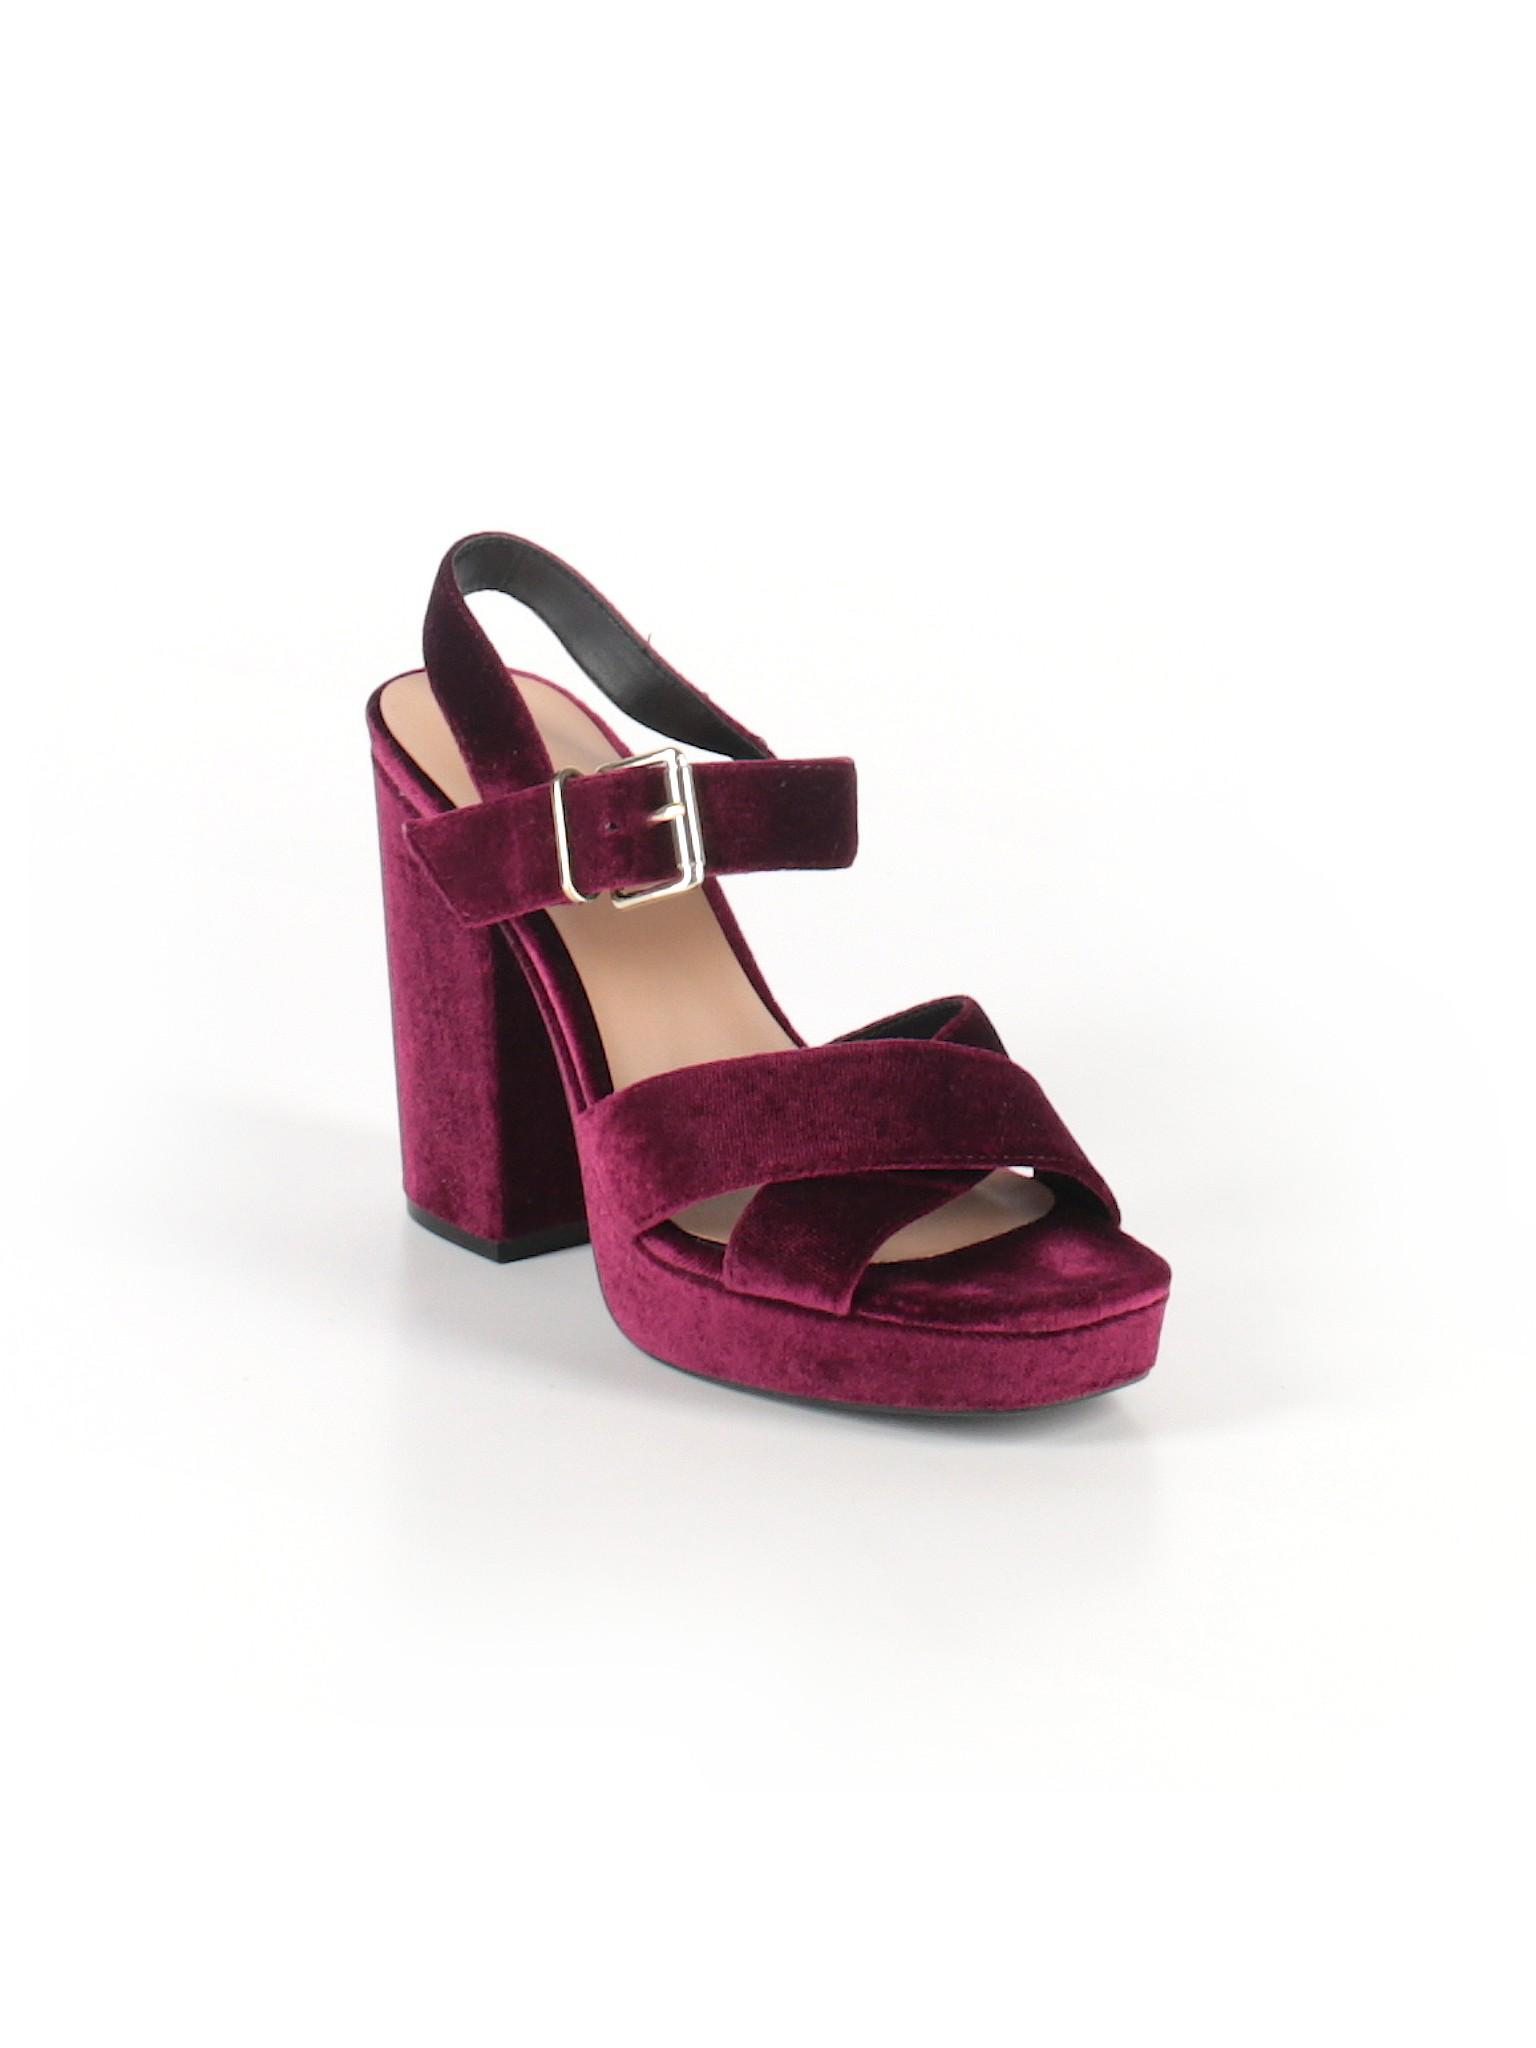 promotion Boutique Heels J9aVXSALLt Mossimo Supply HFFCZqxO